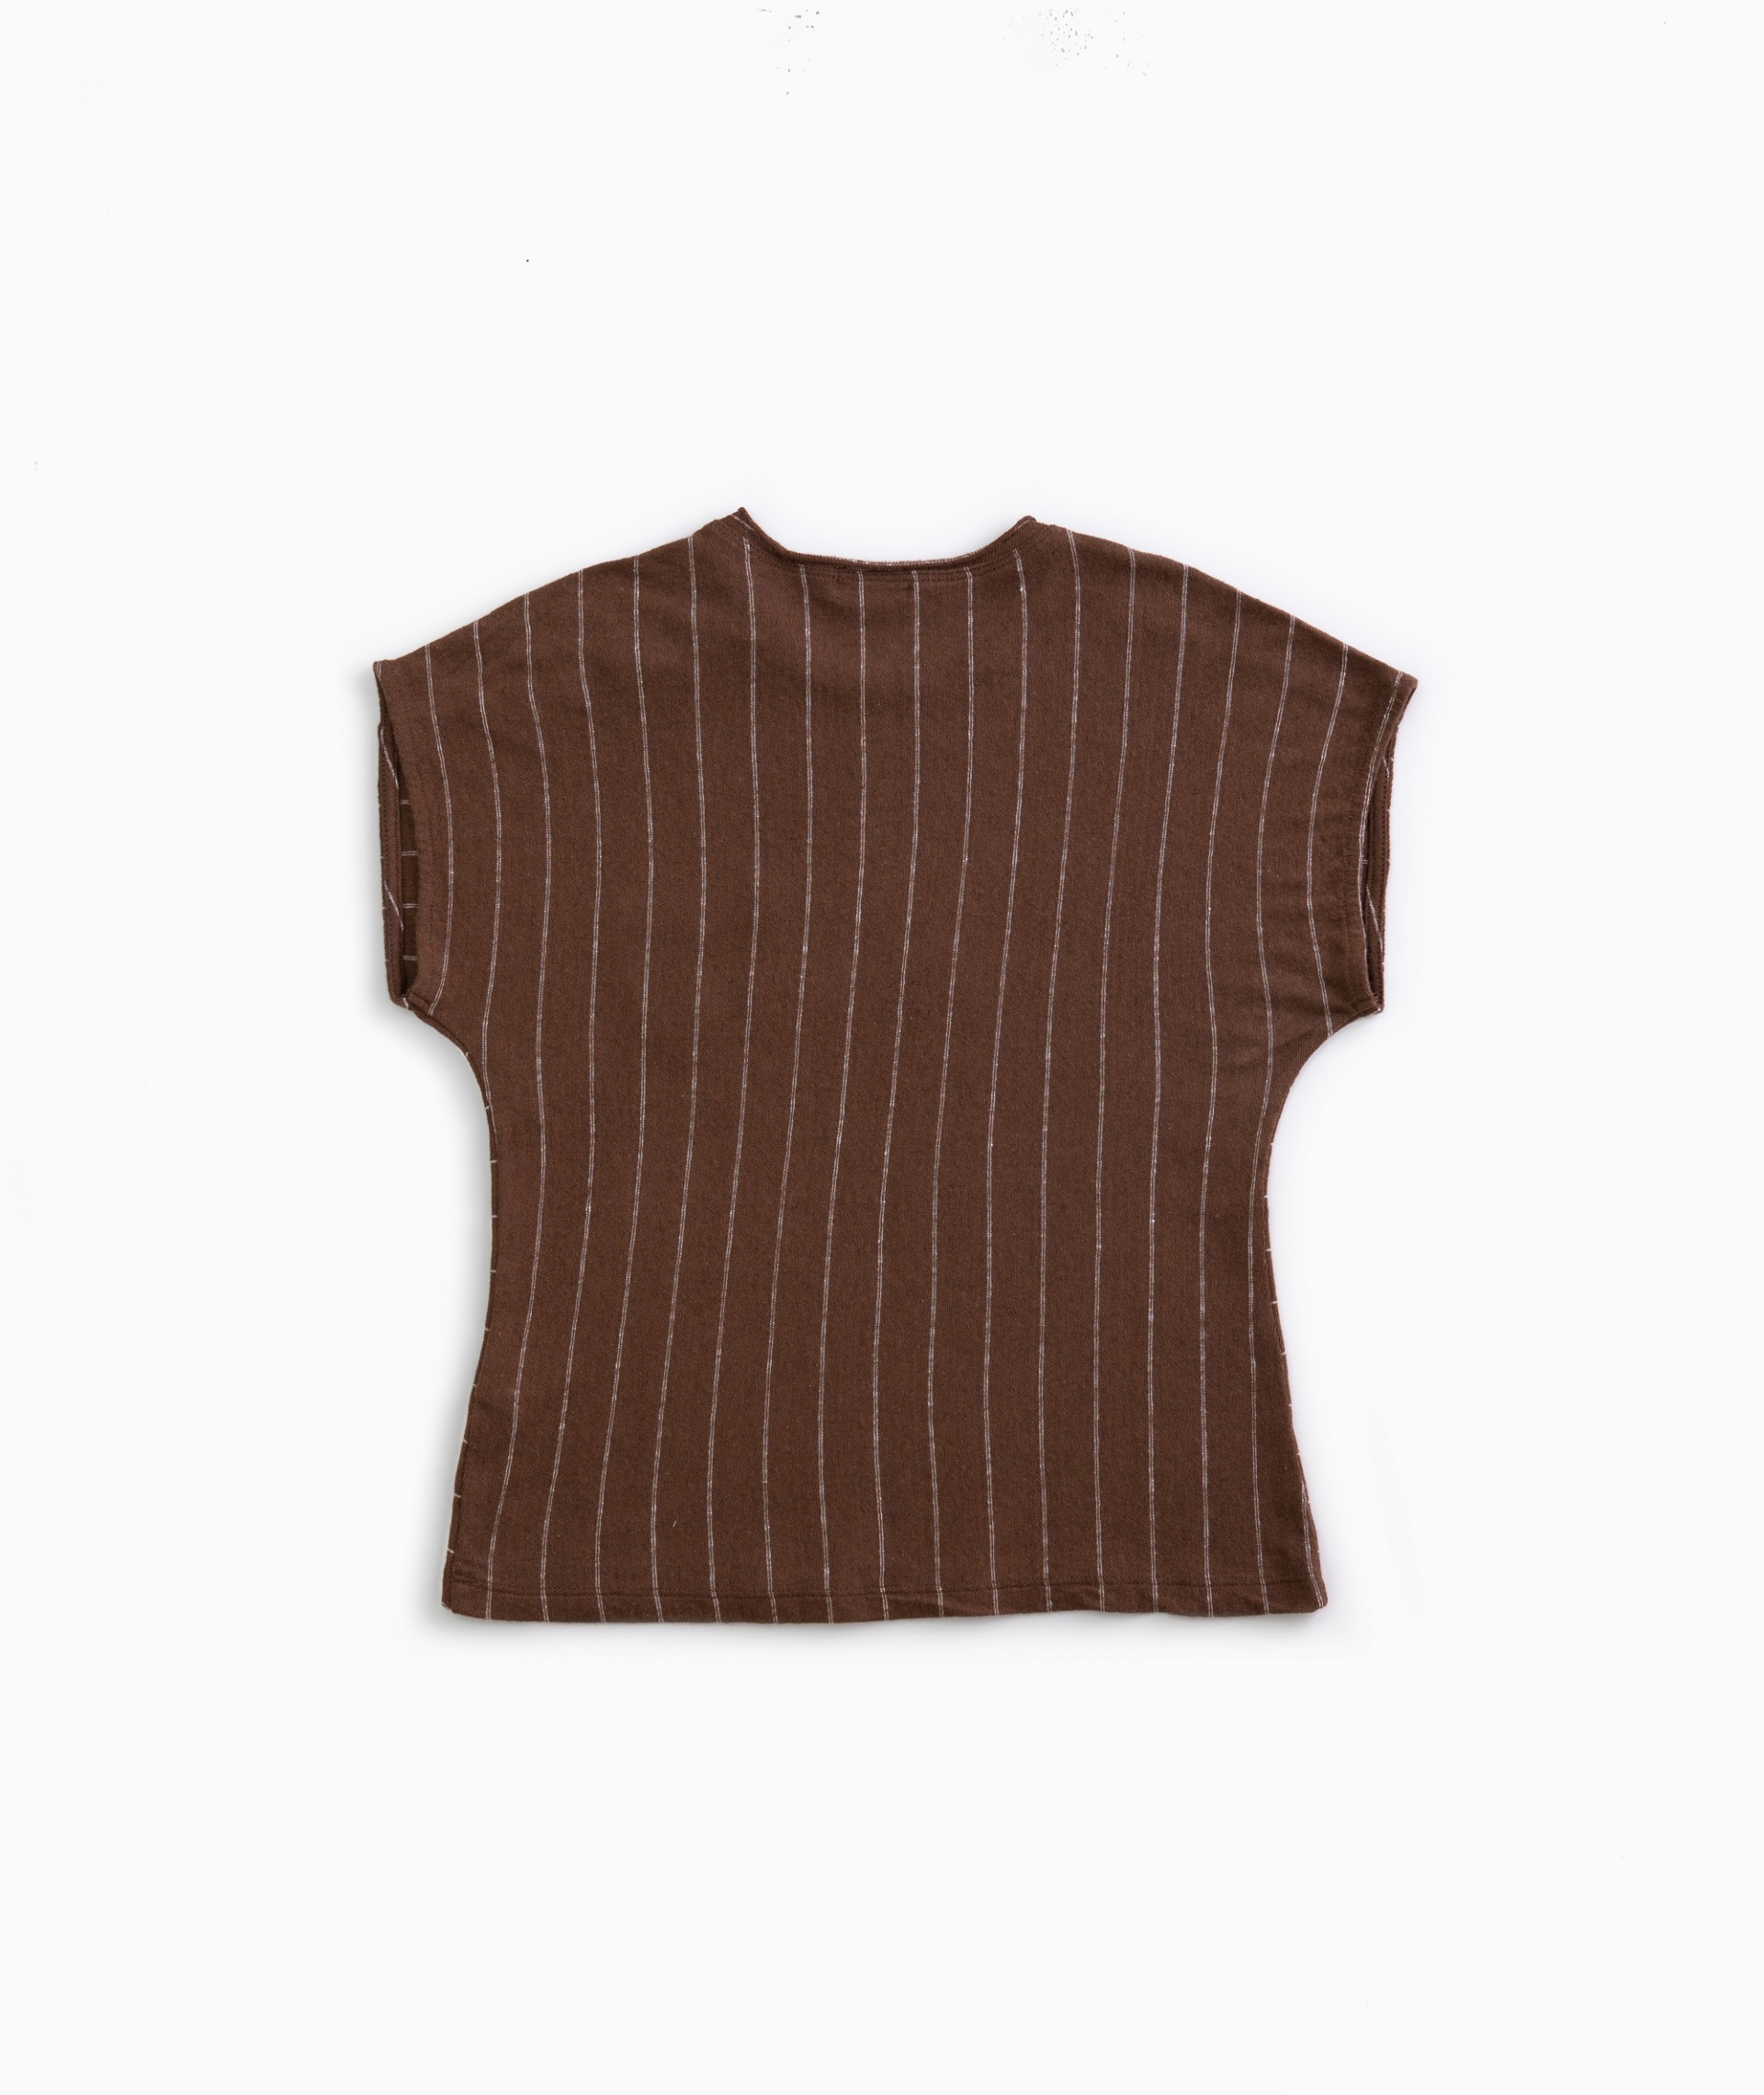 Camiseta de algodón-lino  | Weaving